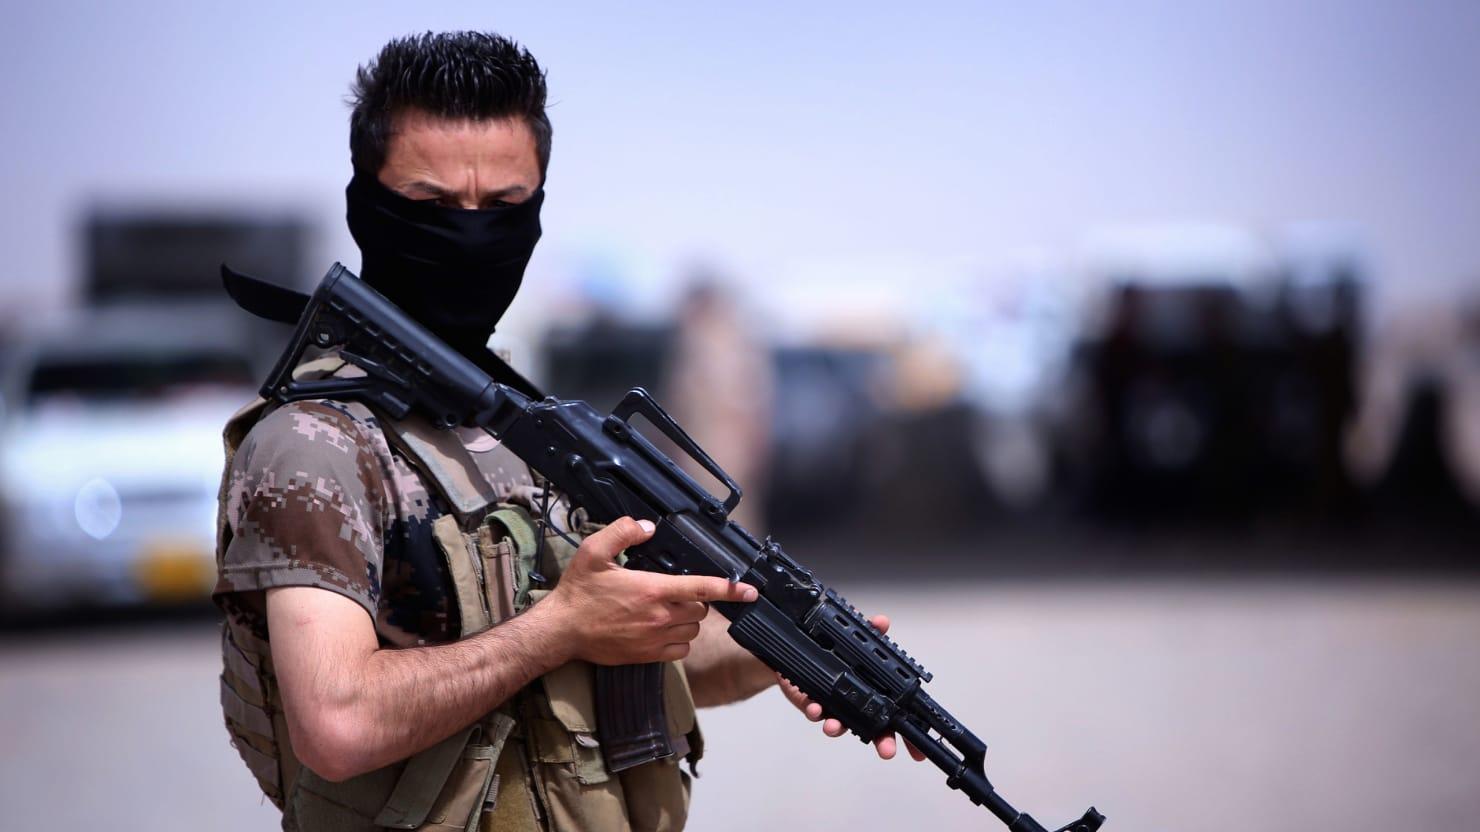 'Practically Speaking, Iraq Has Broken Apart'